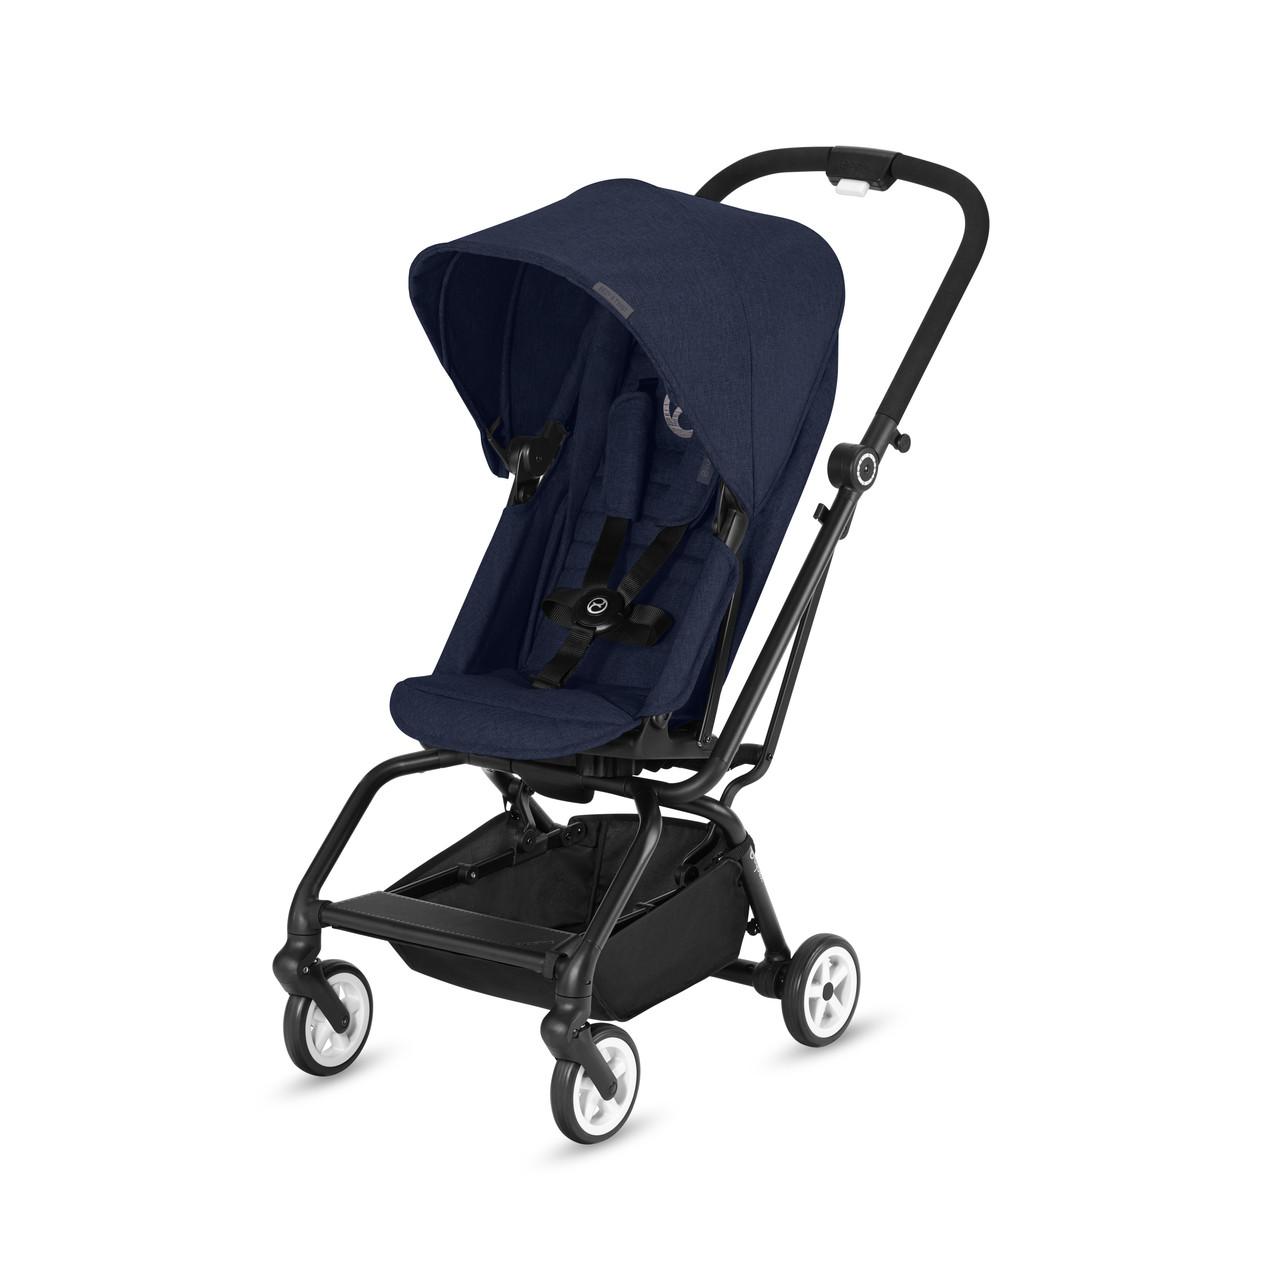 Cybex - Прогулочная коляска Eezy S Twist, цвет Denim Blue